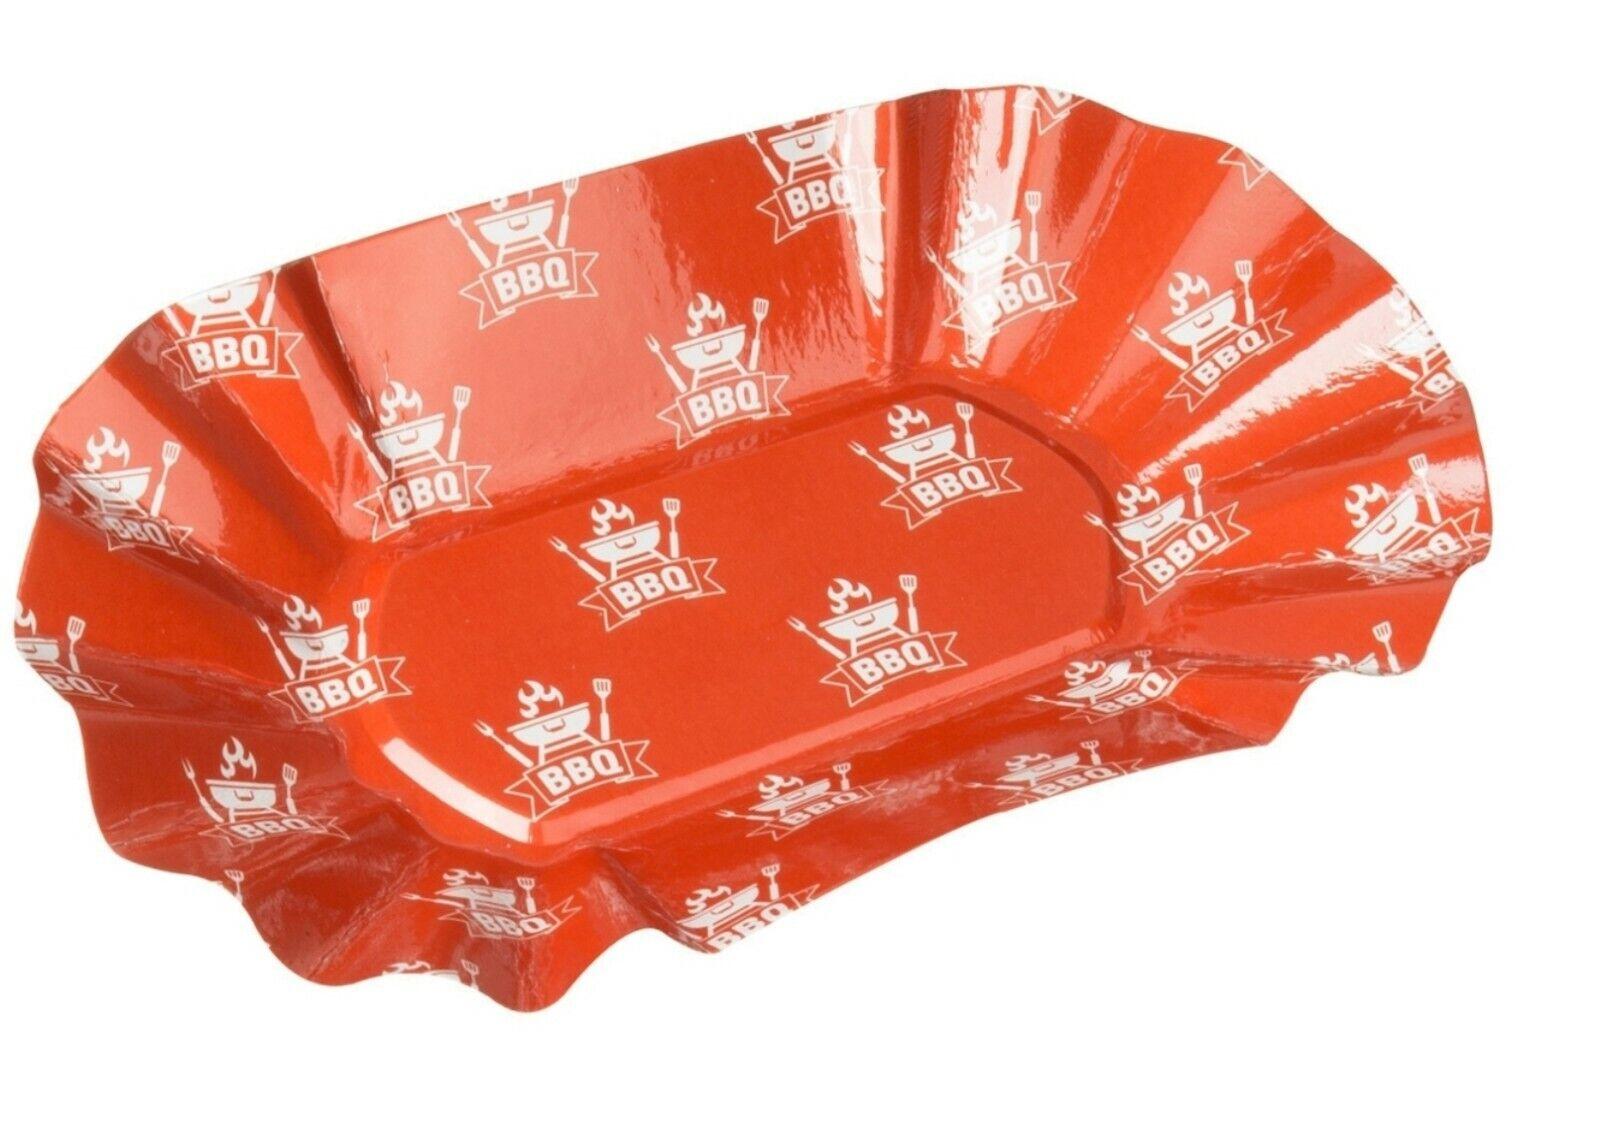 Pommesschalen BBQ, 8 Stück, Papierschalen Pappteller Einwegteller Partydeko